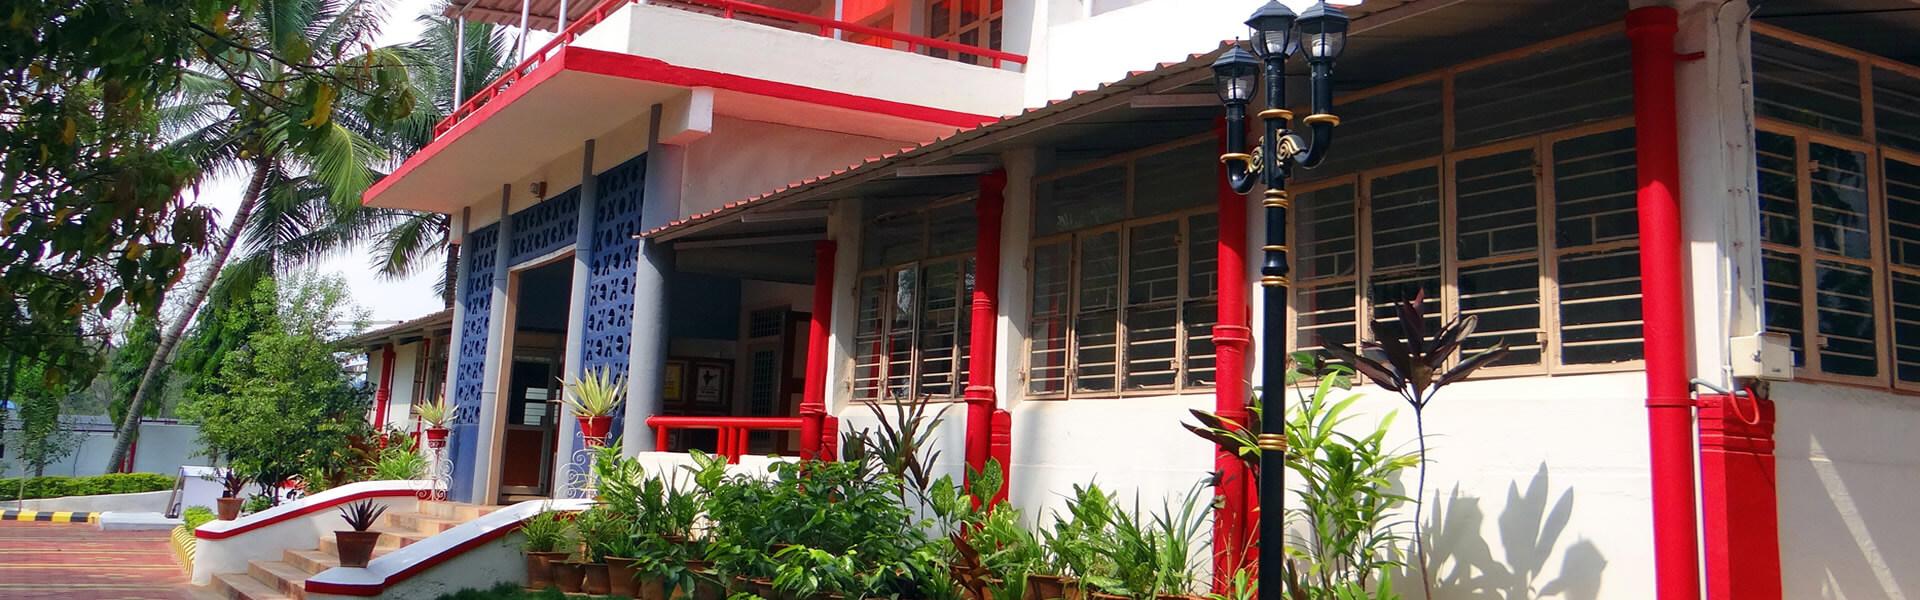 Agence immobiliere dakar s n gal location et vente villas for Agence immobiliere dakar